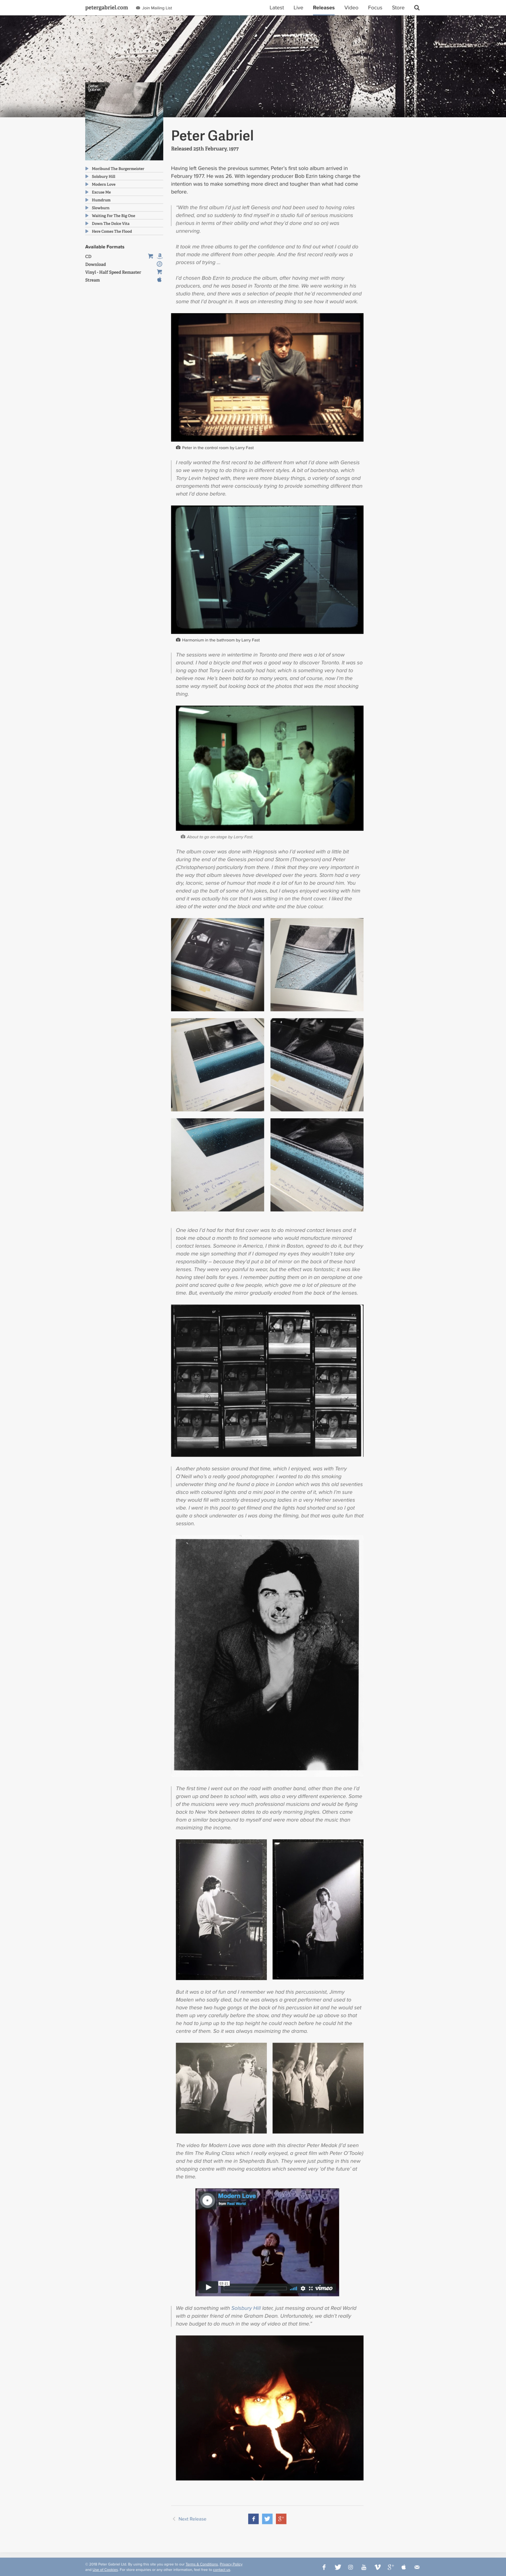 Website design for Peter Gabriel's official site